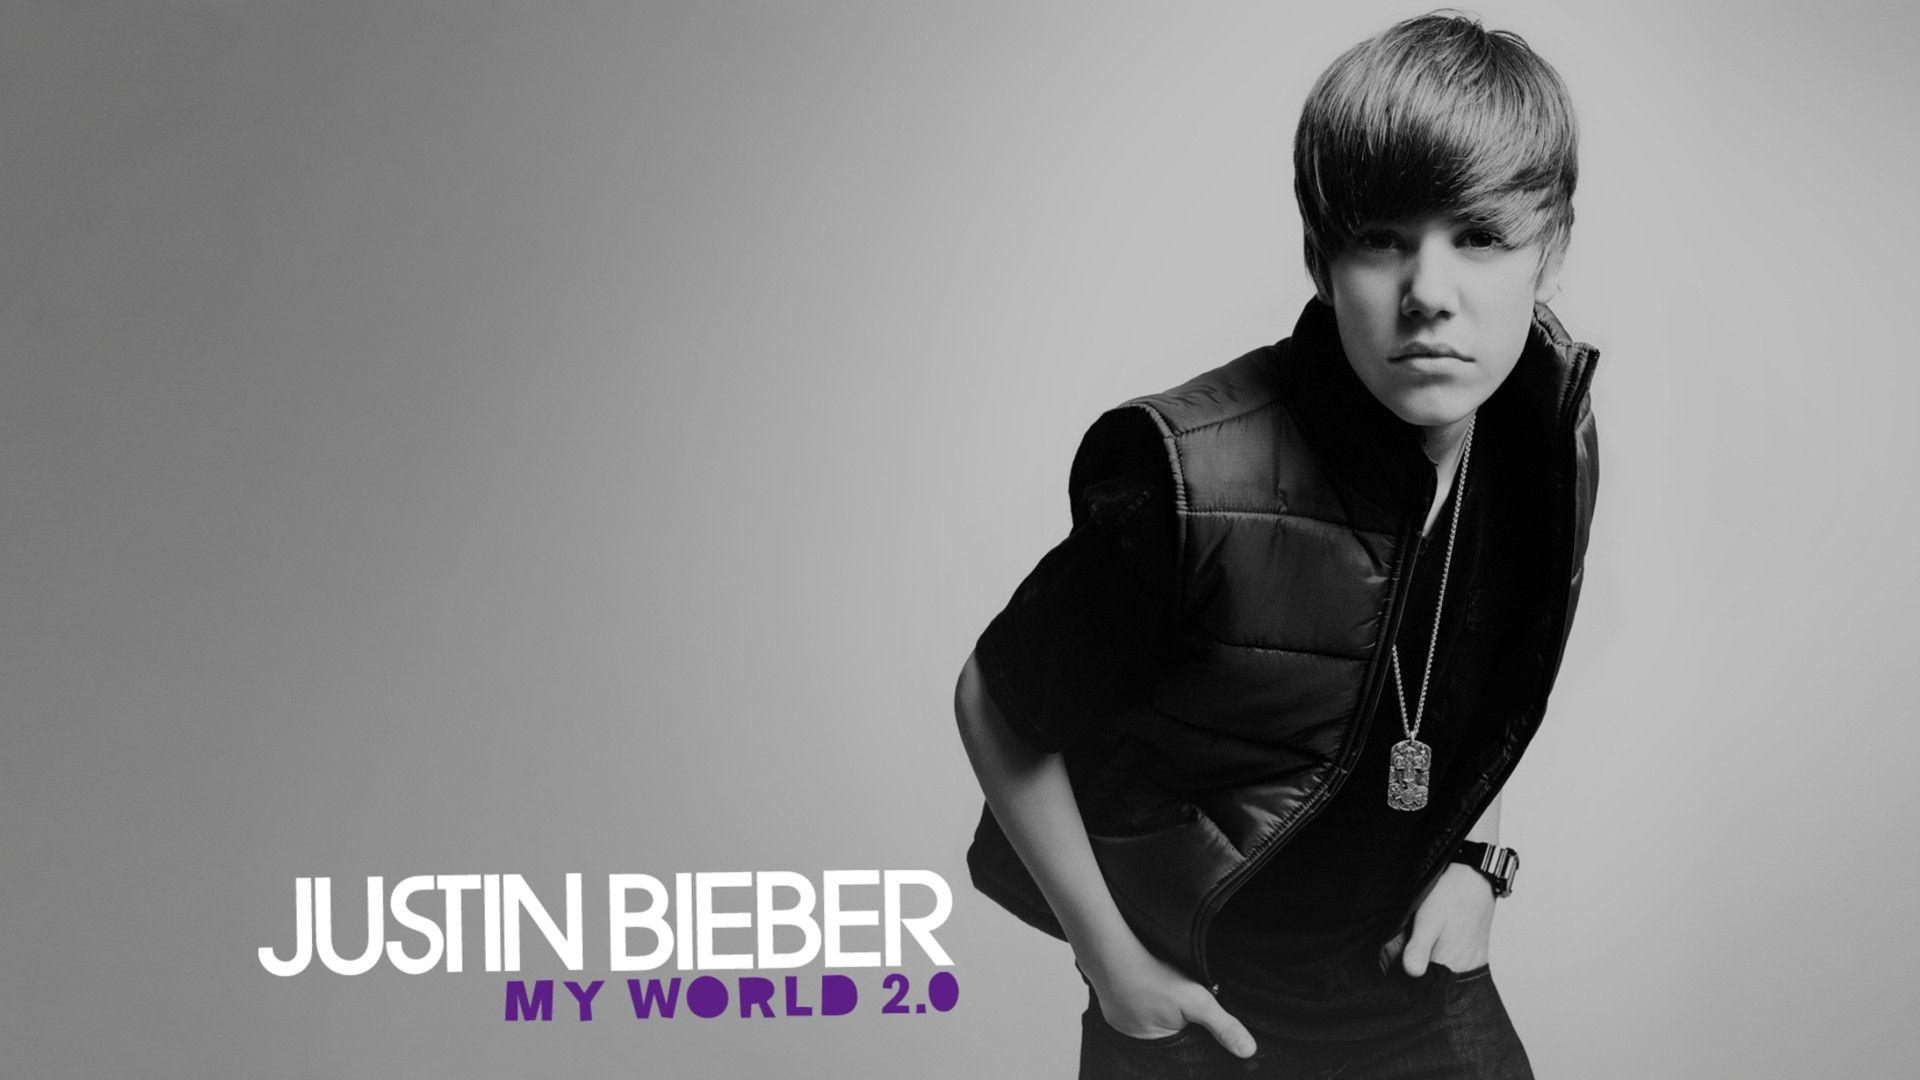 Justin Bieber Wallpapers HD  Wallpaper